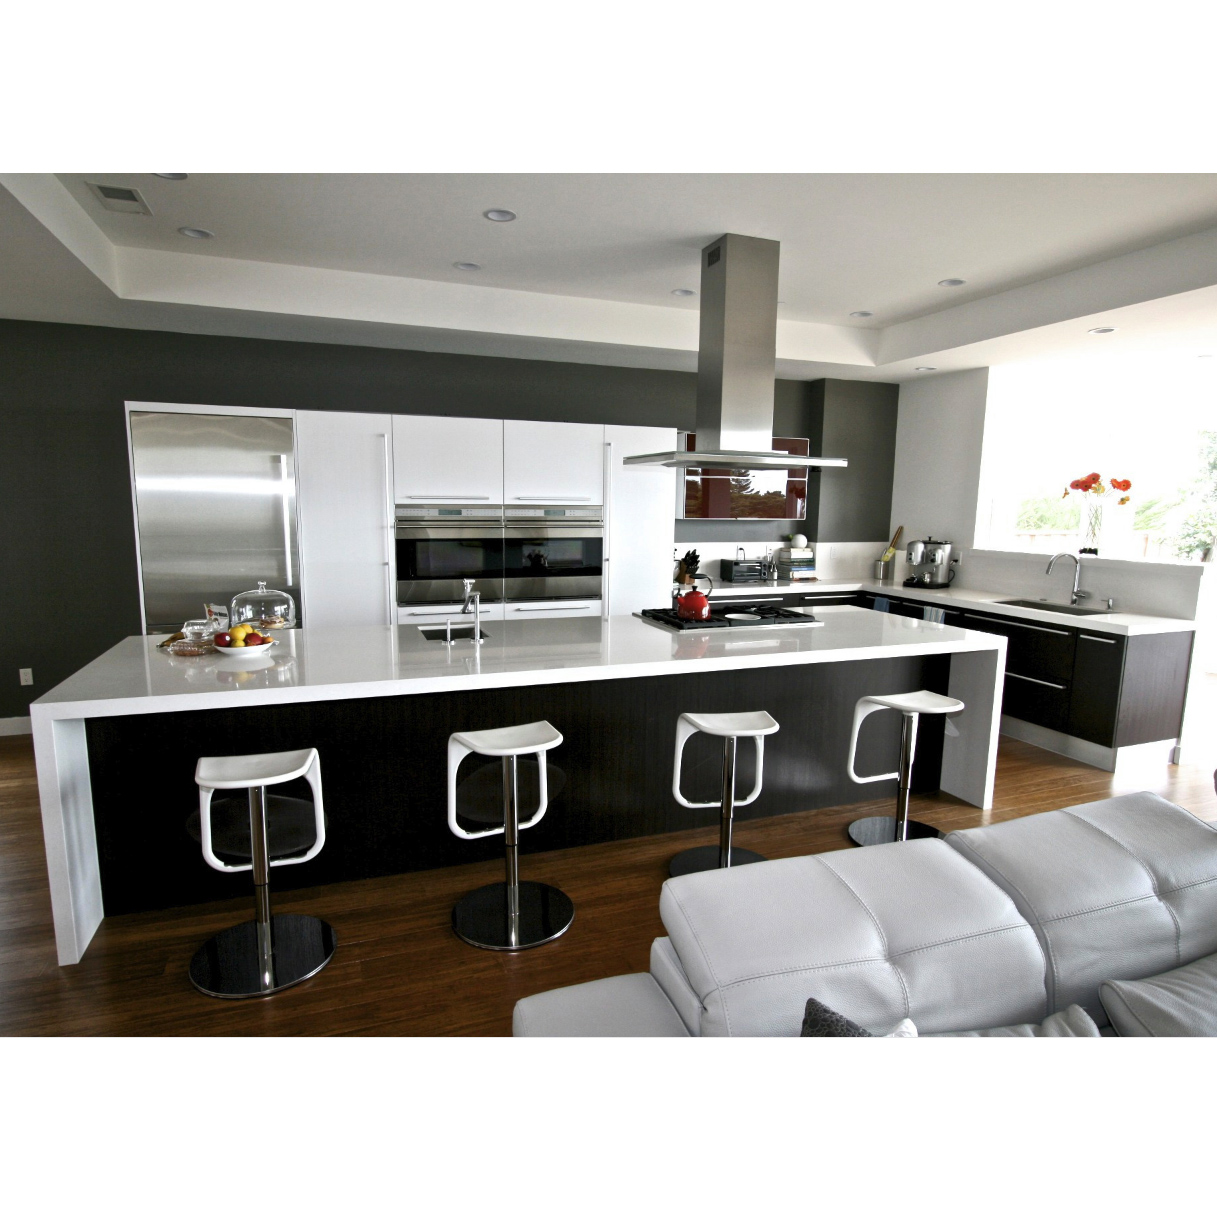 AisDecor cheap lacquer cabinets international trader-2